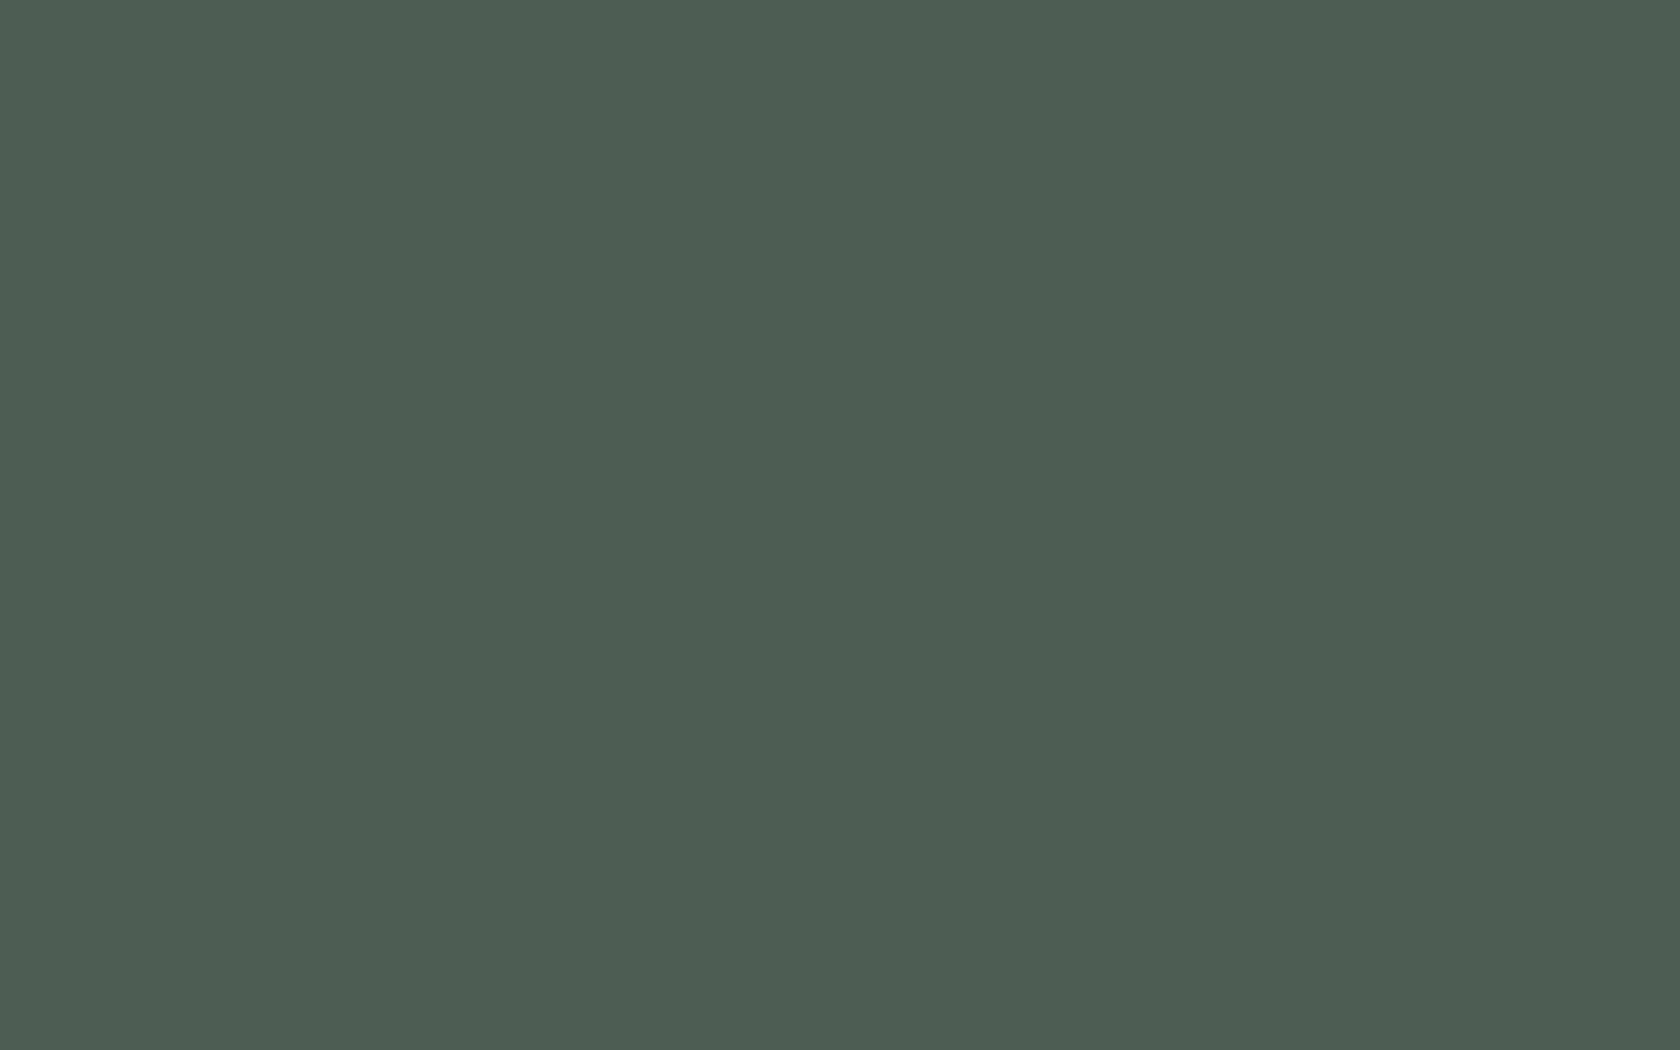 1680x1050 Feldgrau Solid Color Background